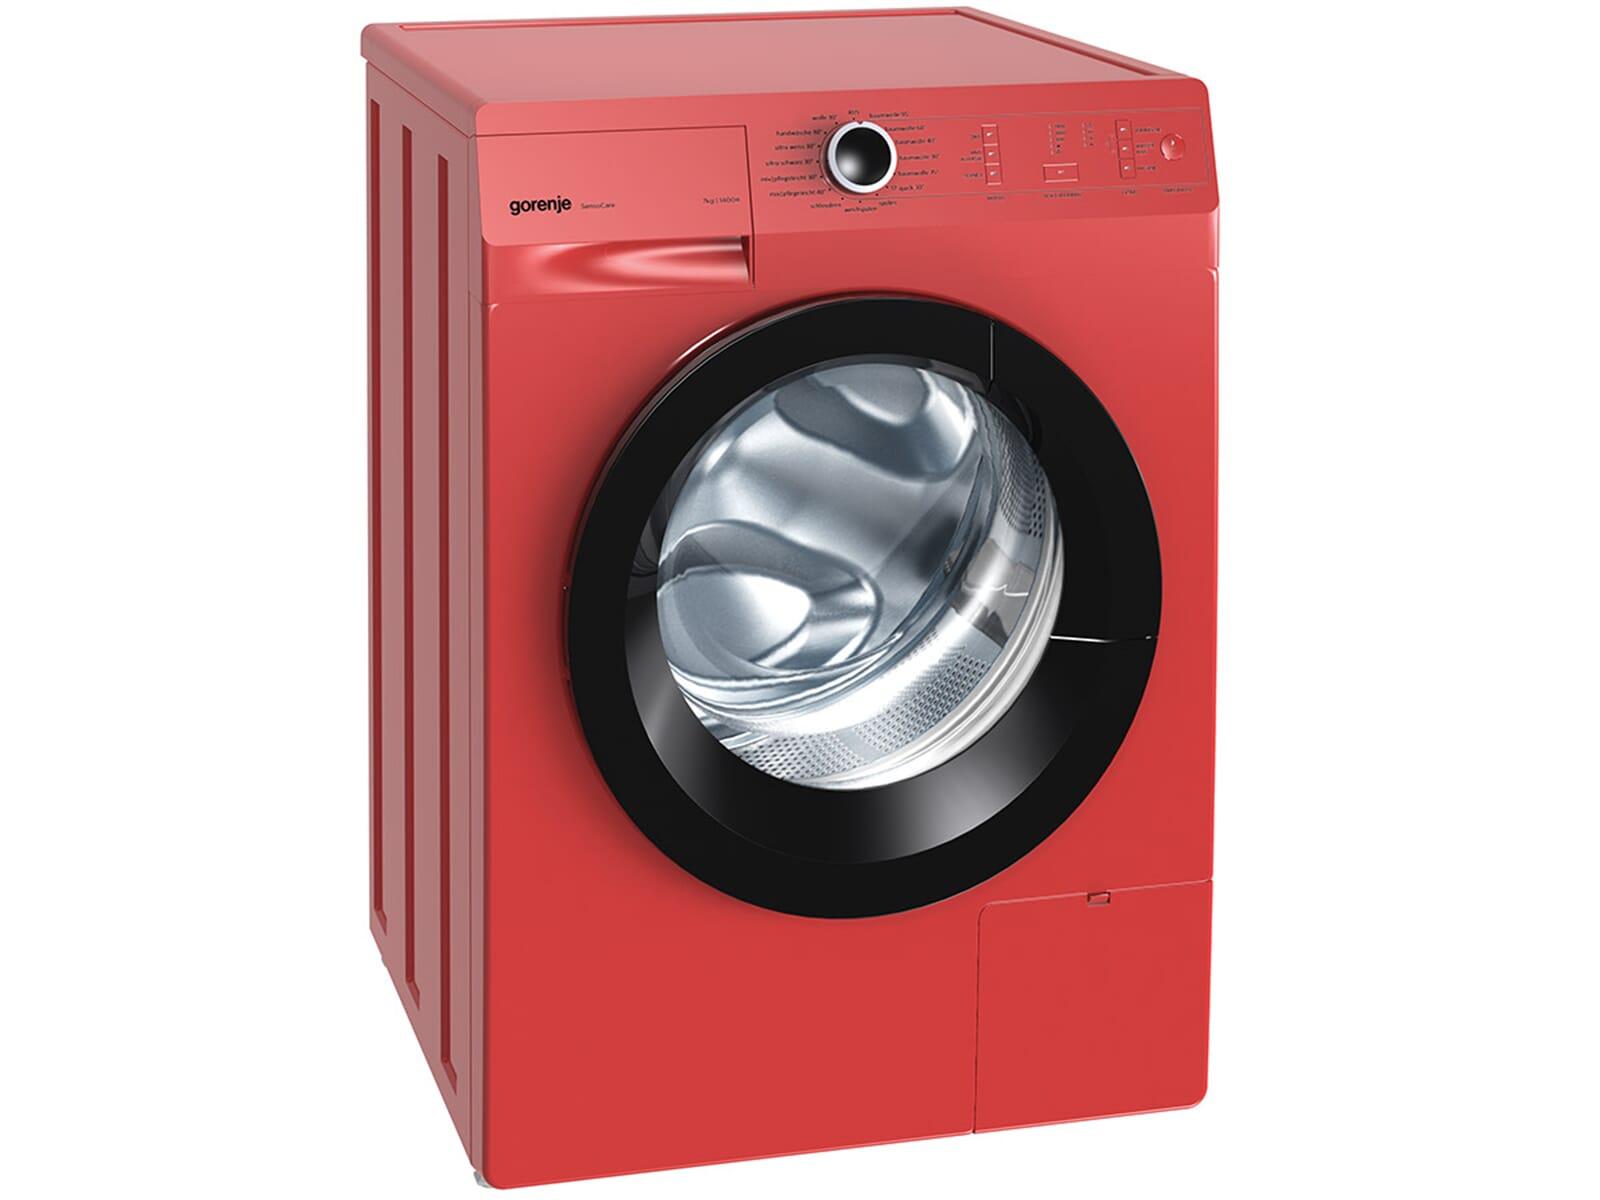 gorenje w7243pr stand waschmaschine rot f r 348 90 eur. Black Bedroom Furniture Sets. Home Design Ideas